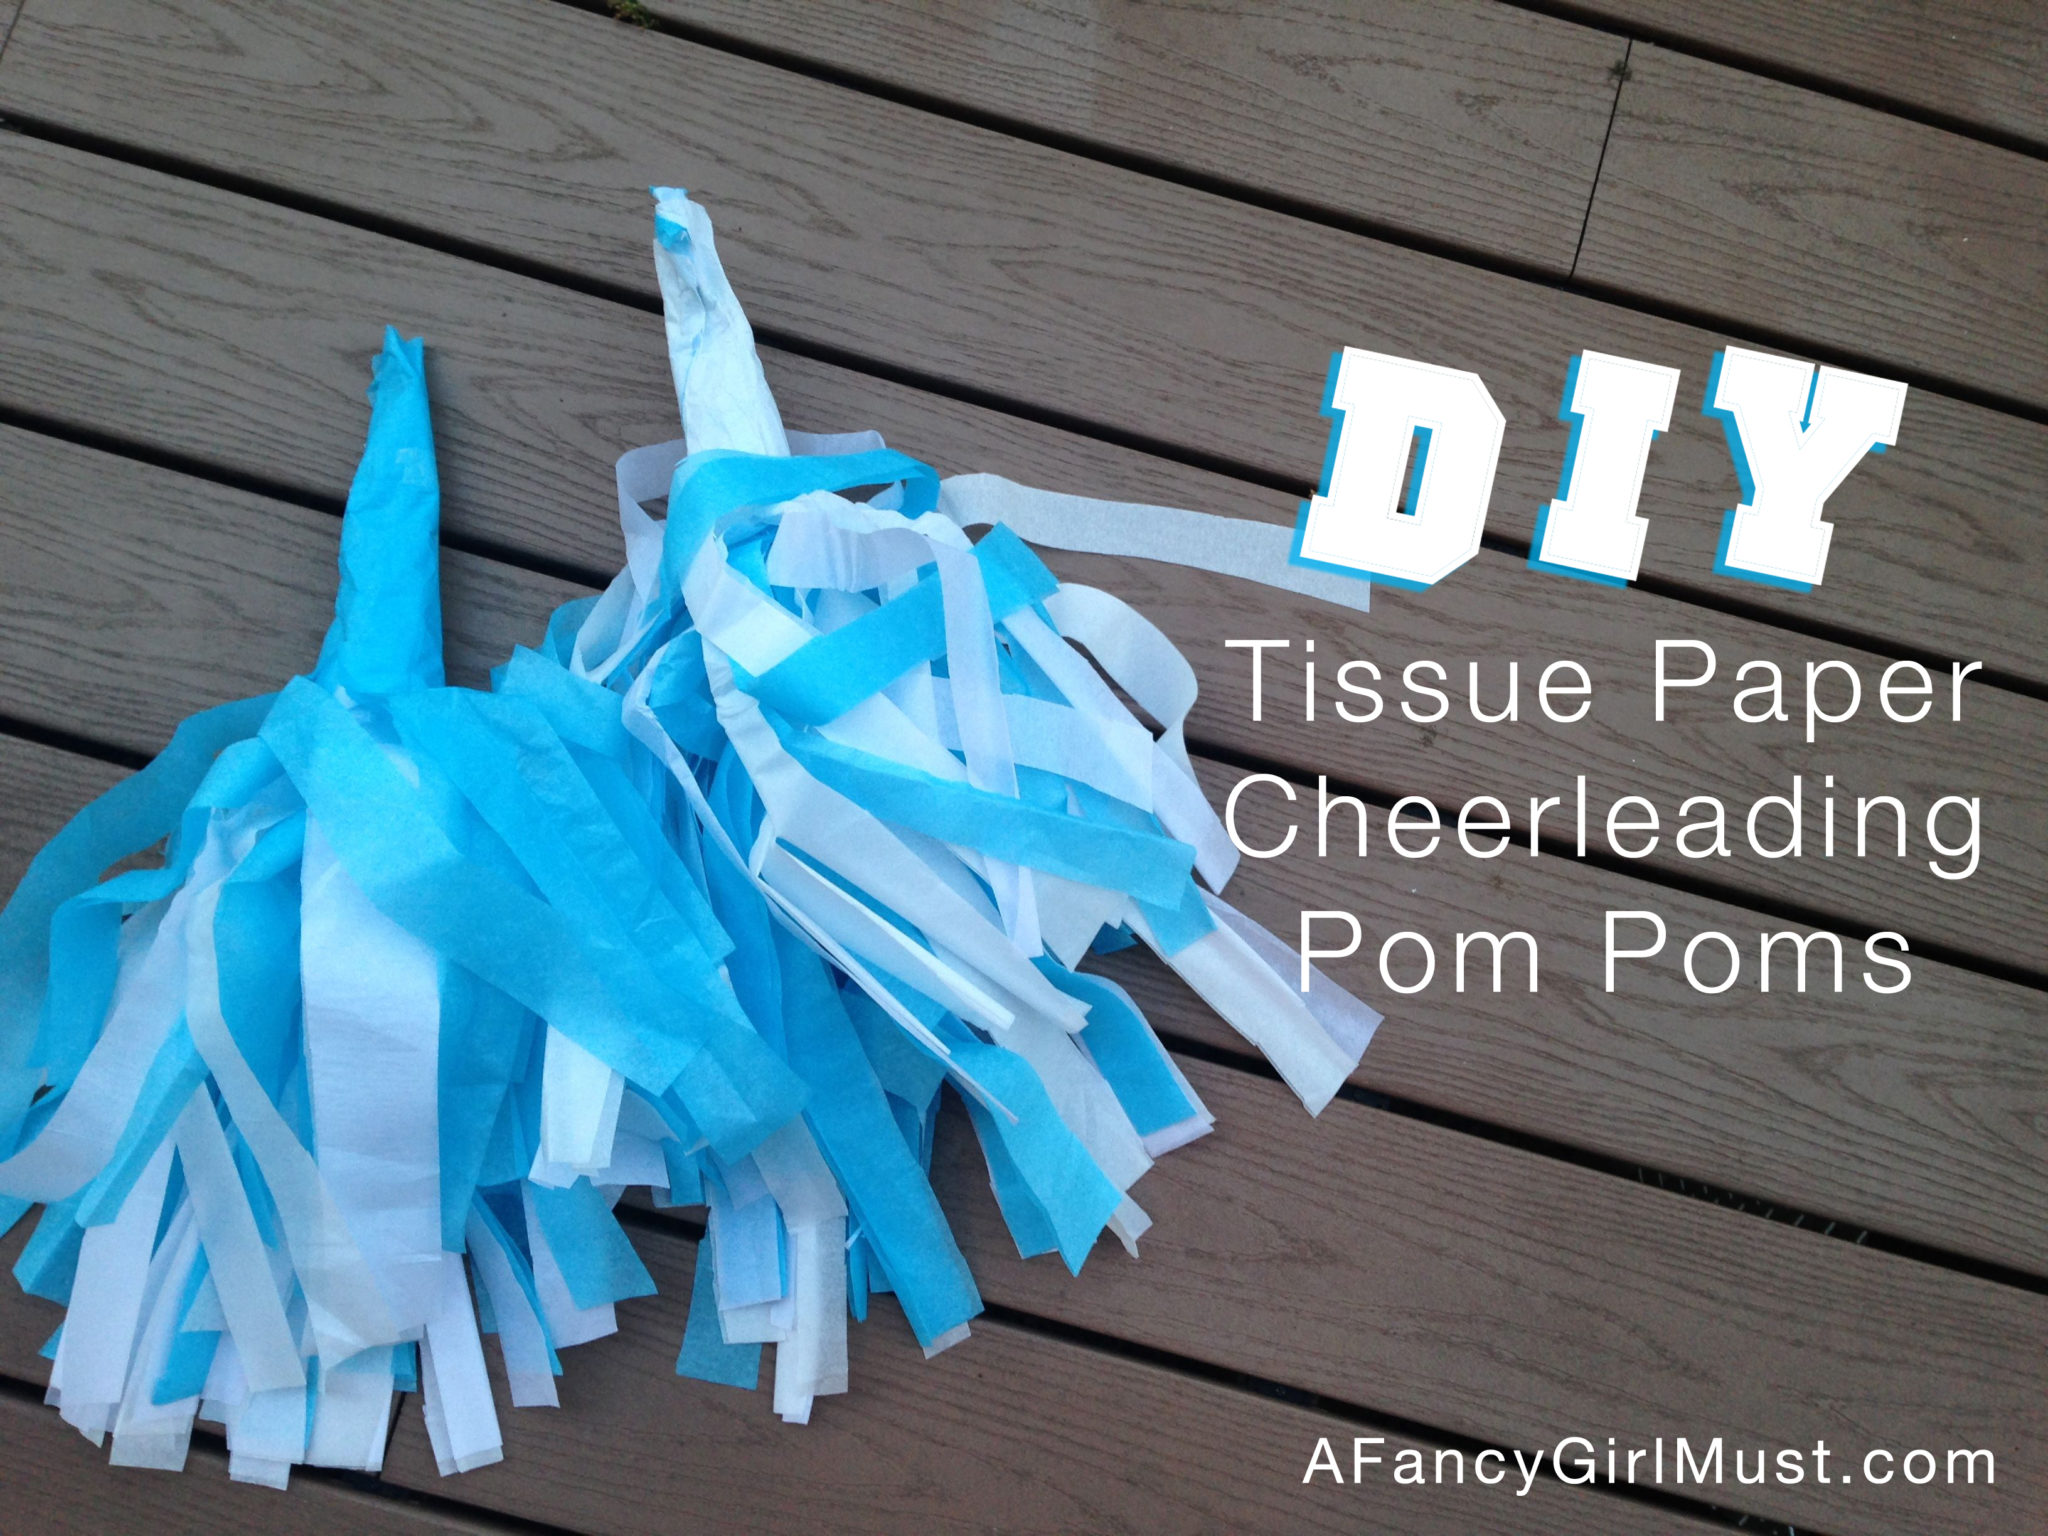 diy tissue paper cheerleading pom poms a fancy girl must. Black Bedroom Furniture Sets. Home Design Ideas